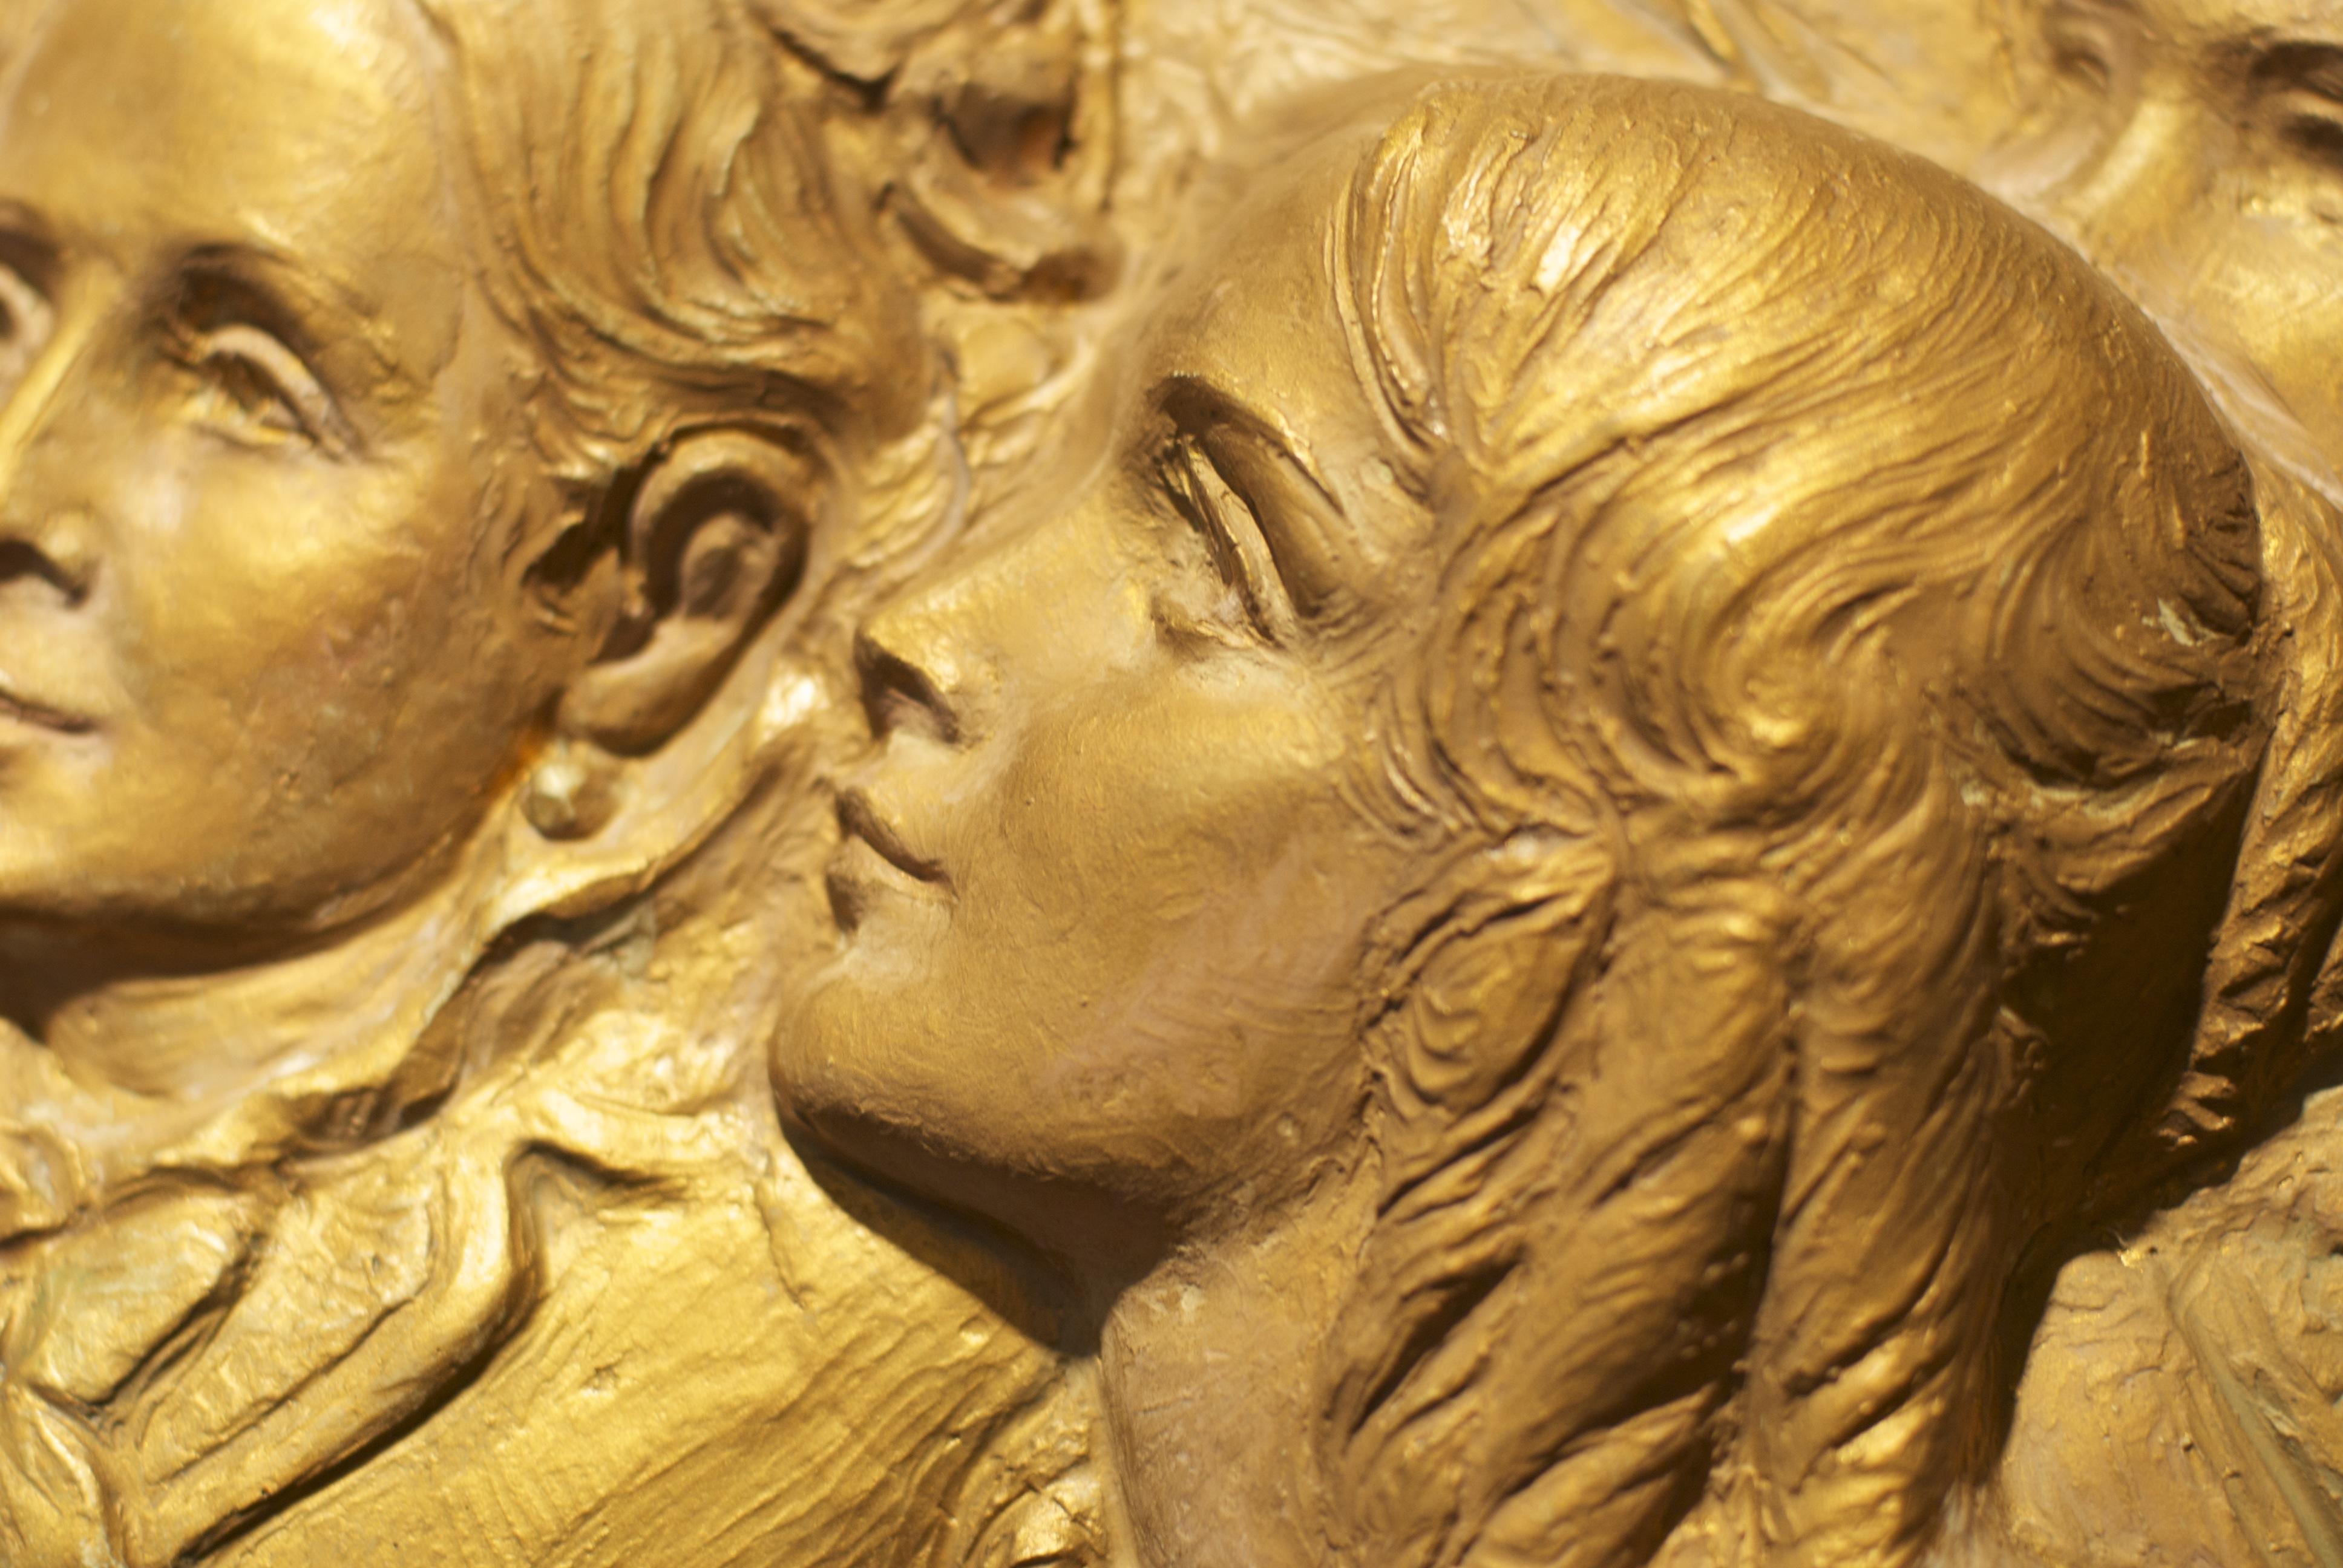 Detail of bas relief sculpted by Elaine Brockbank Evans, in the Berkeley Ward building, California.